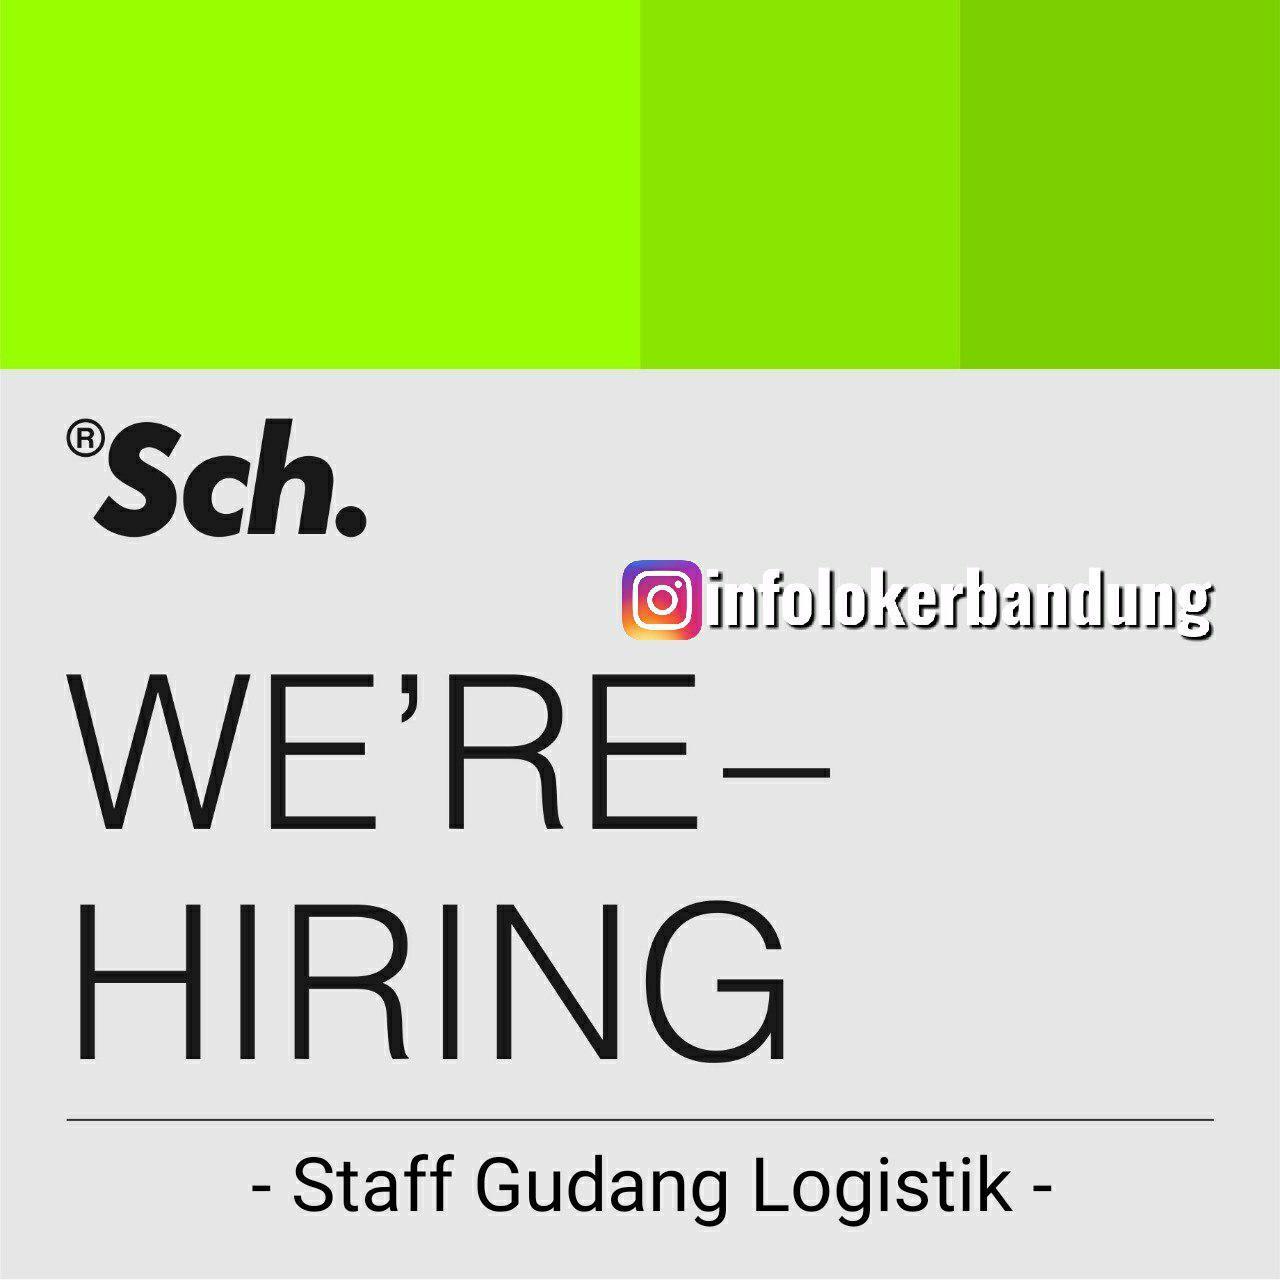 Lowongan Kerja Staff Gudang Logistik Bandung September 2019